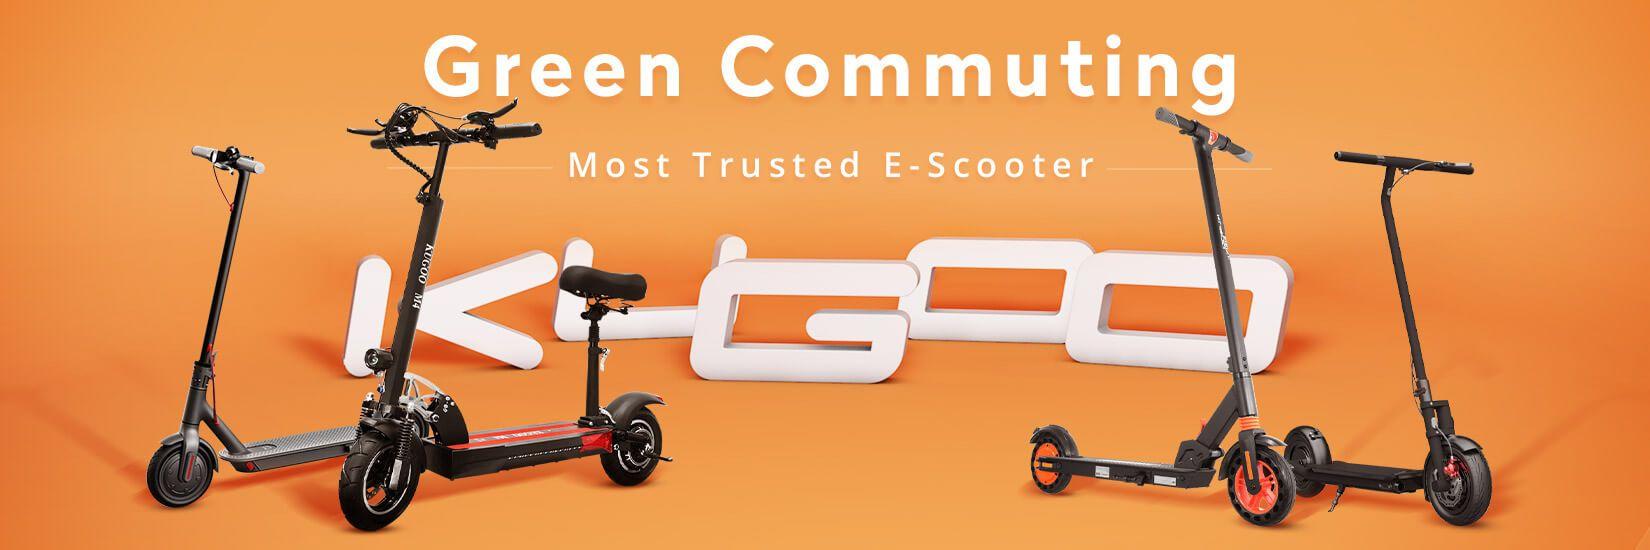 KUGOO Brand Sale - Most Trusted E-Scooter KUGOO - Geekbuying.pl